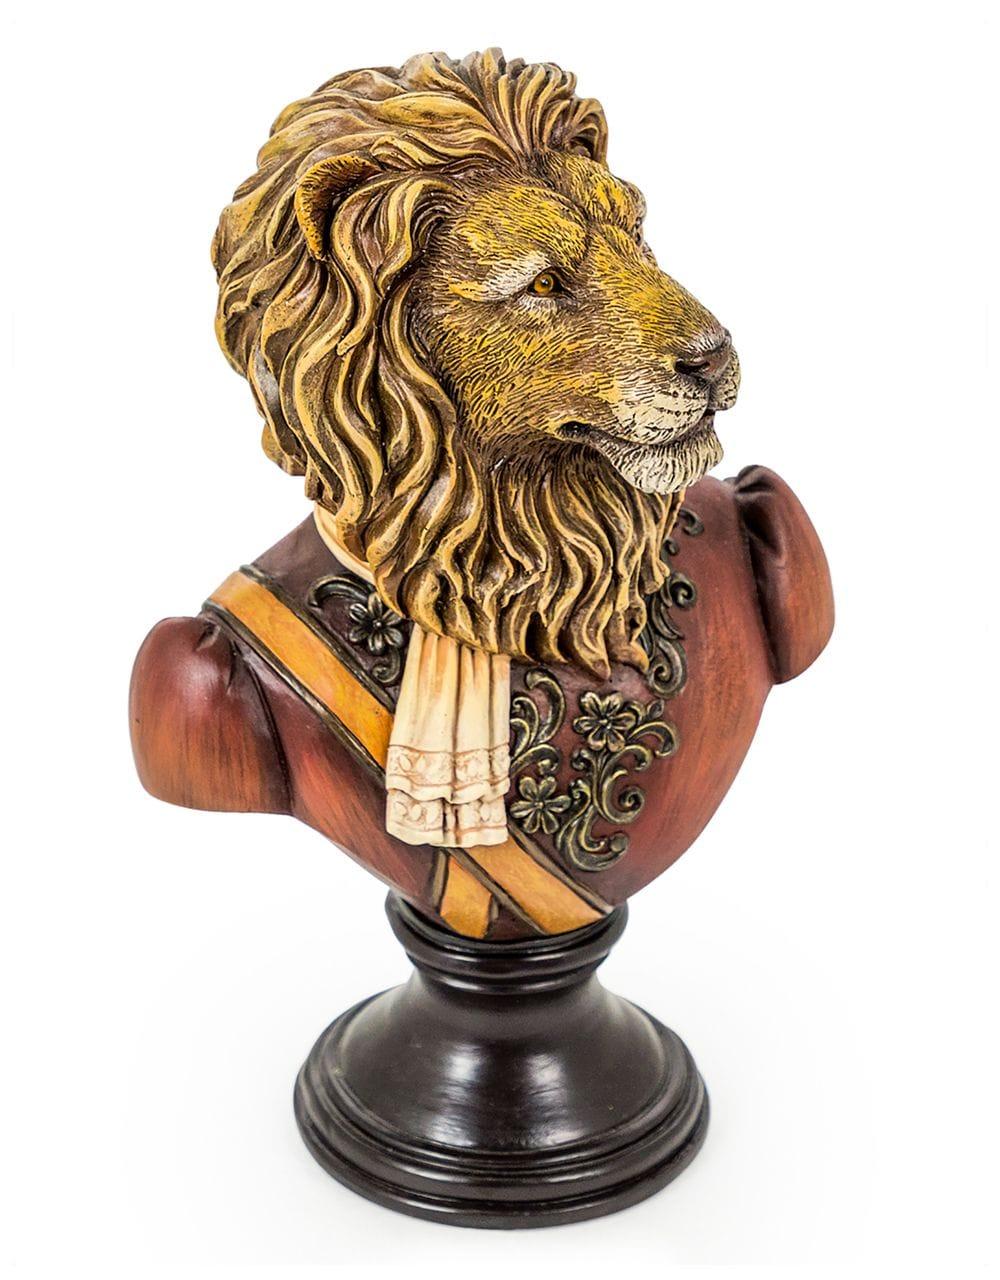 Lion Bust - €69.00 | H34xW21xD15cm